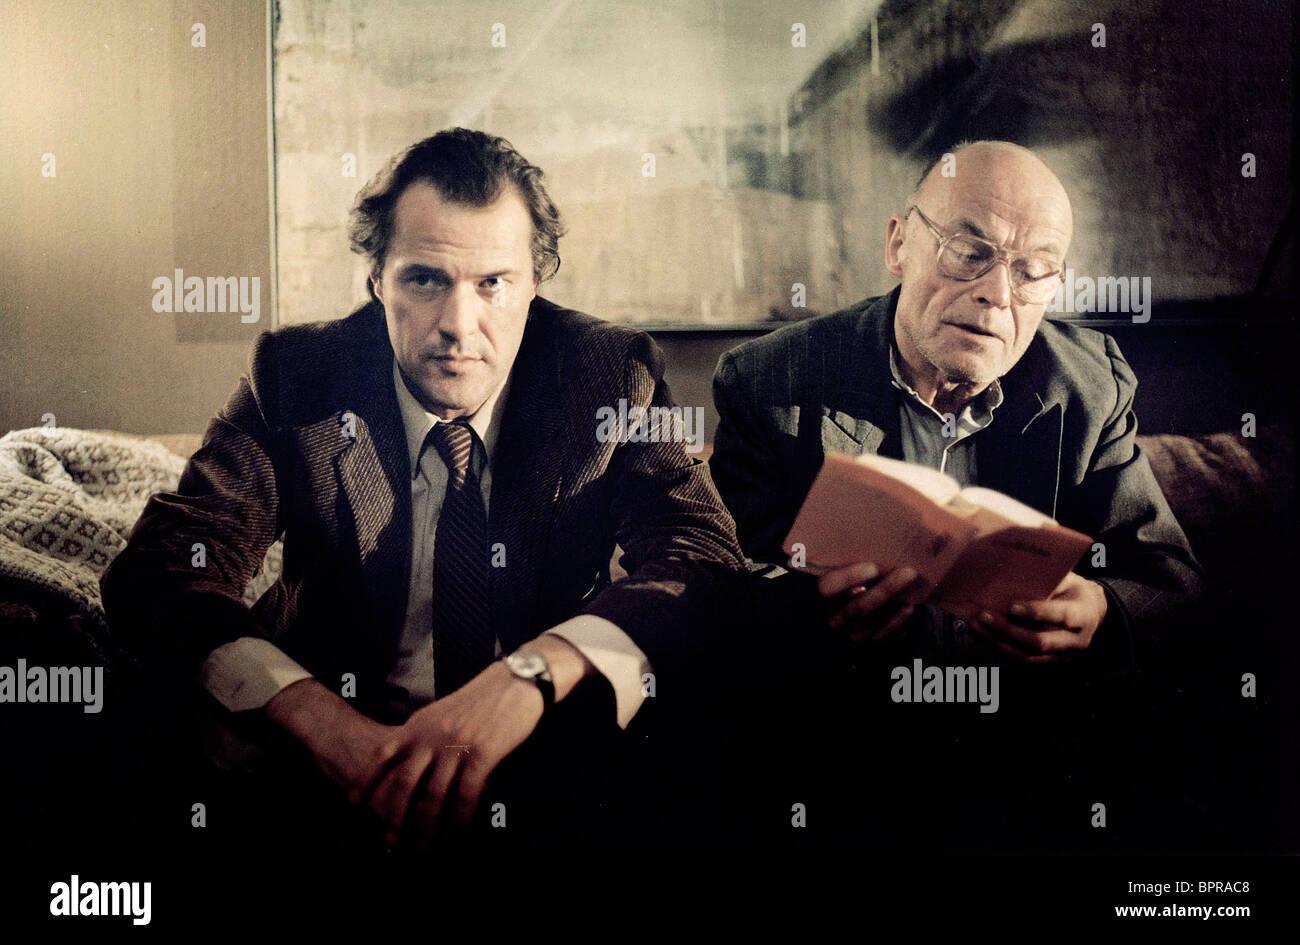 SEBASTIAN KOCH & VOLKMAR KLEINERT THE LIVES OF OTHERS; DAS LEBEN DER ANDEREN (2006) - Stock Image